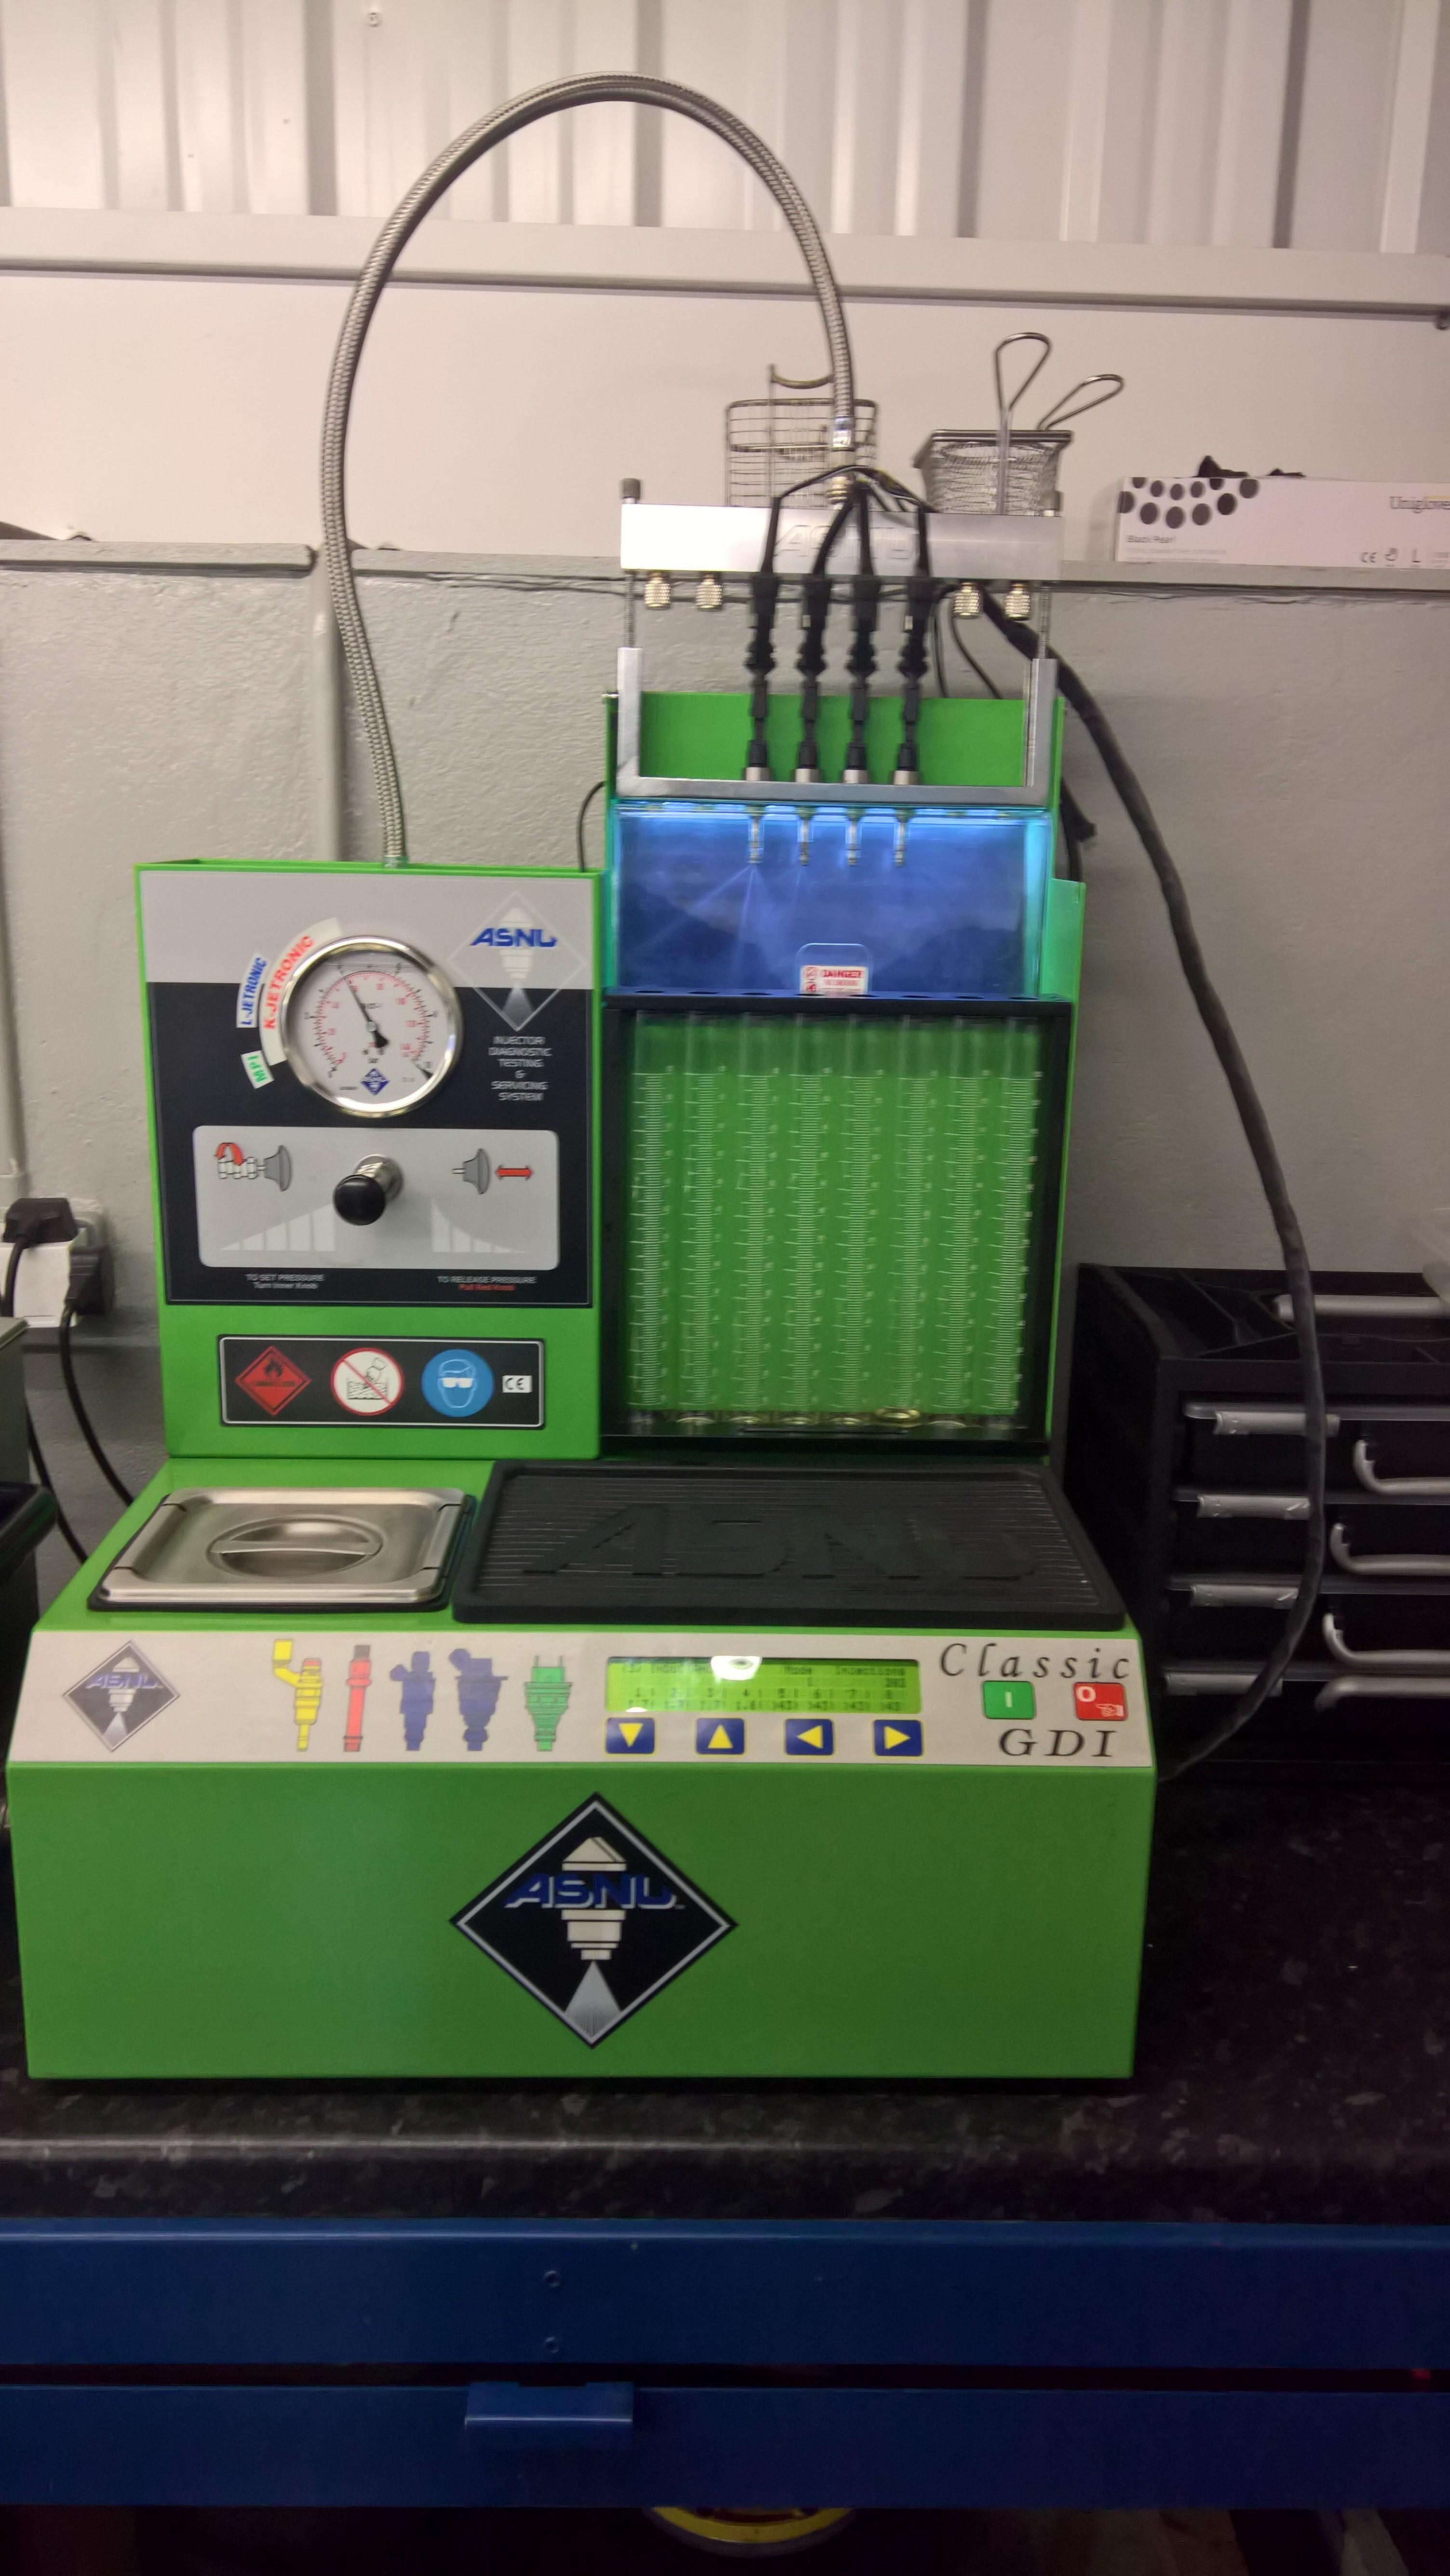 Rangerover Direct petrol injector testing